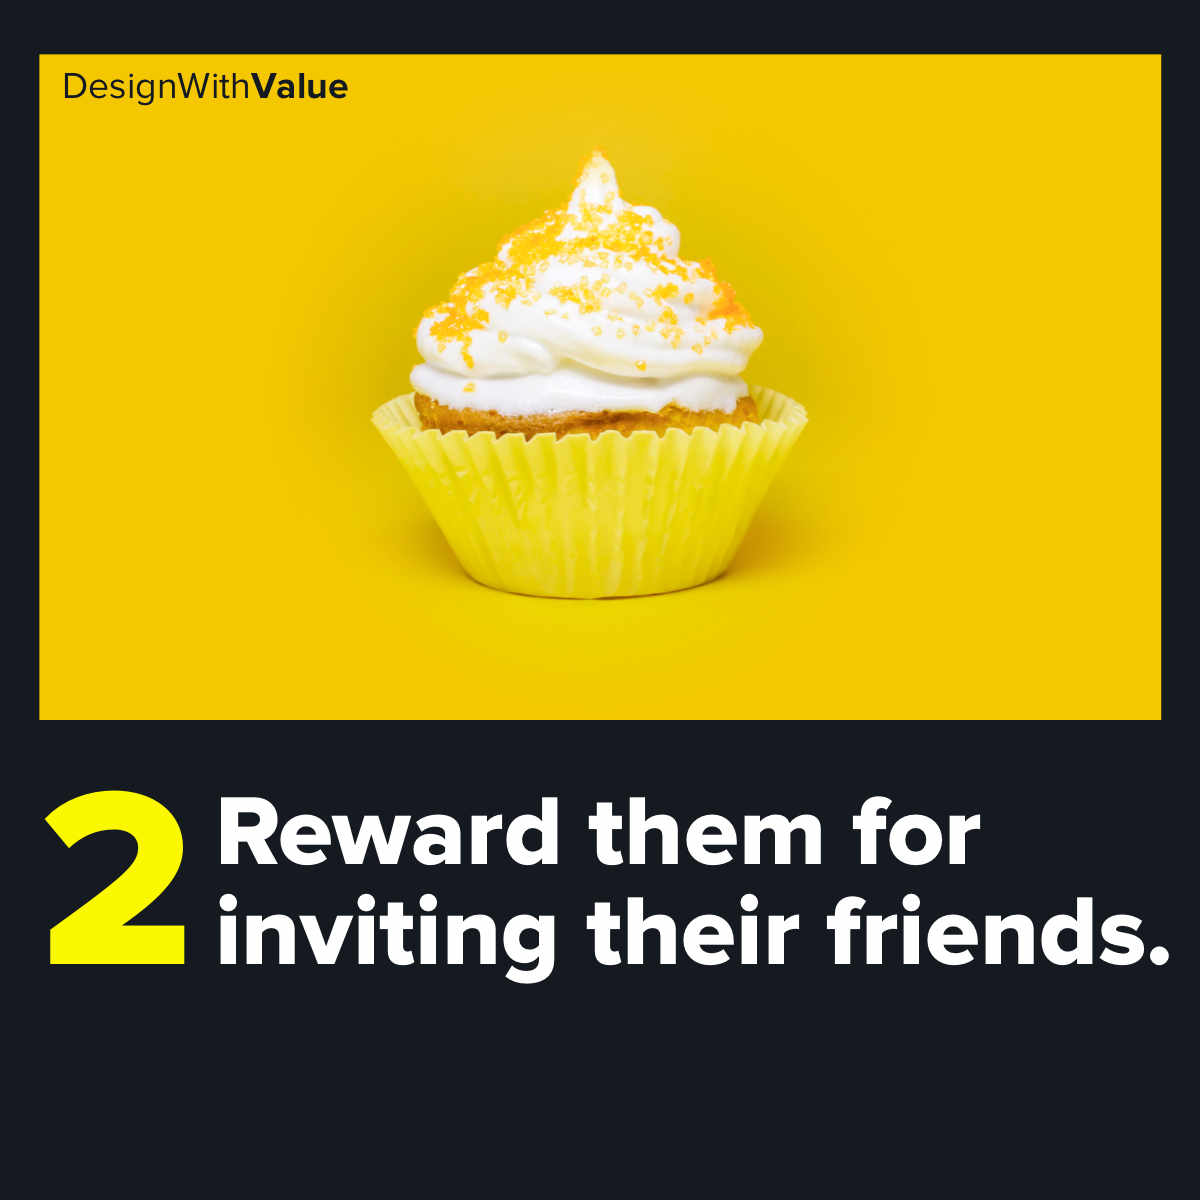 2. Reward them for inviting their friends.